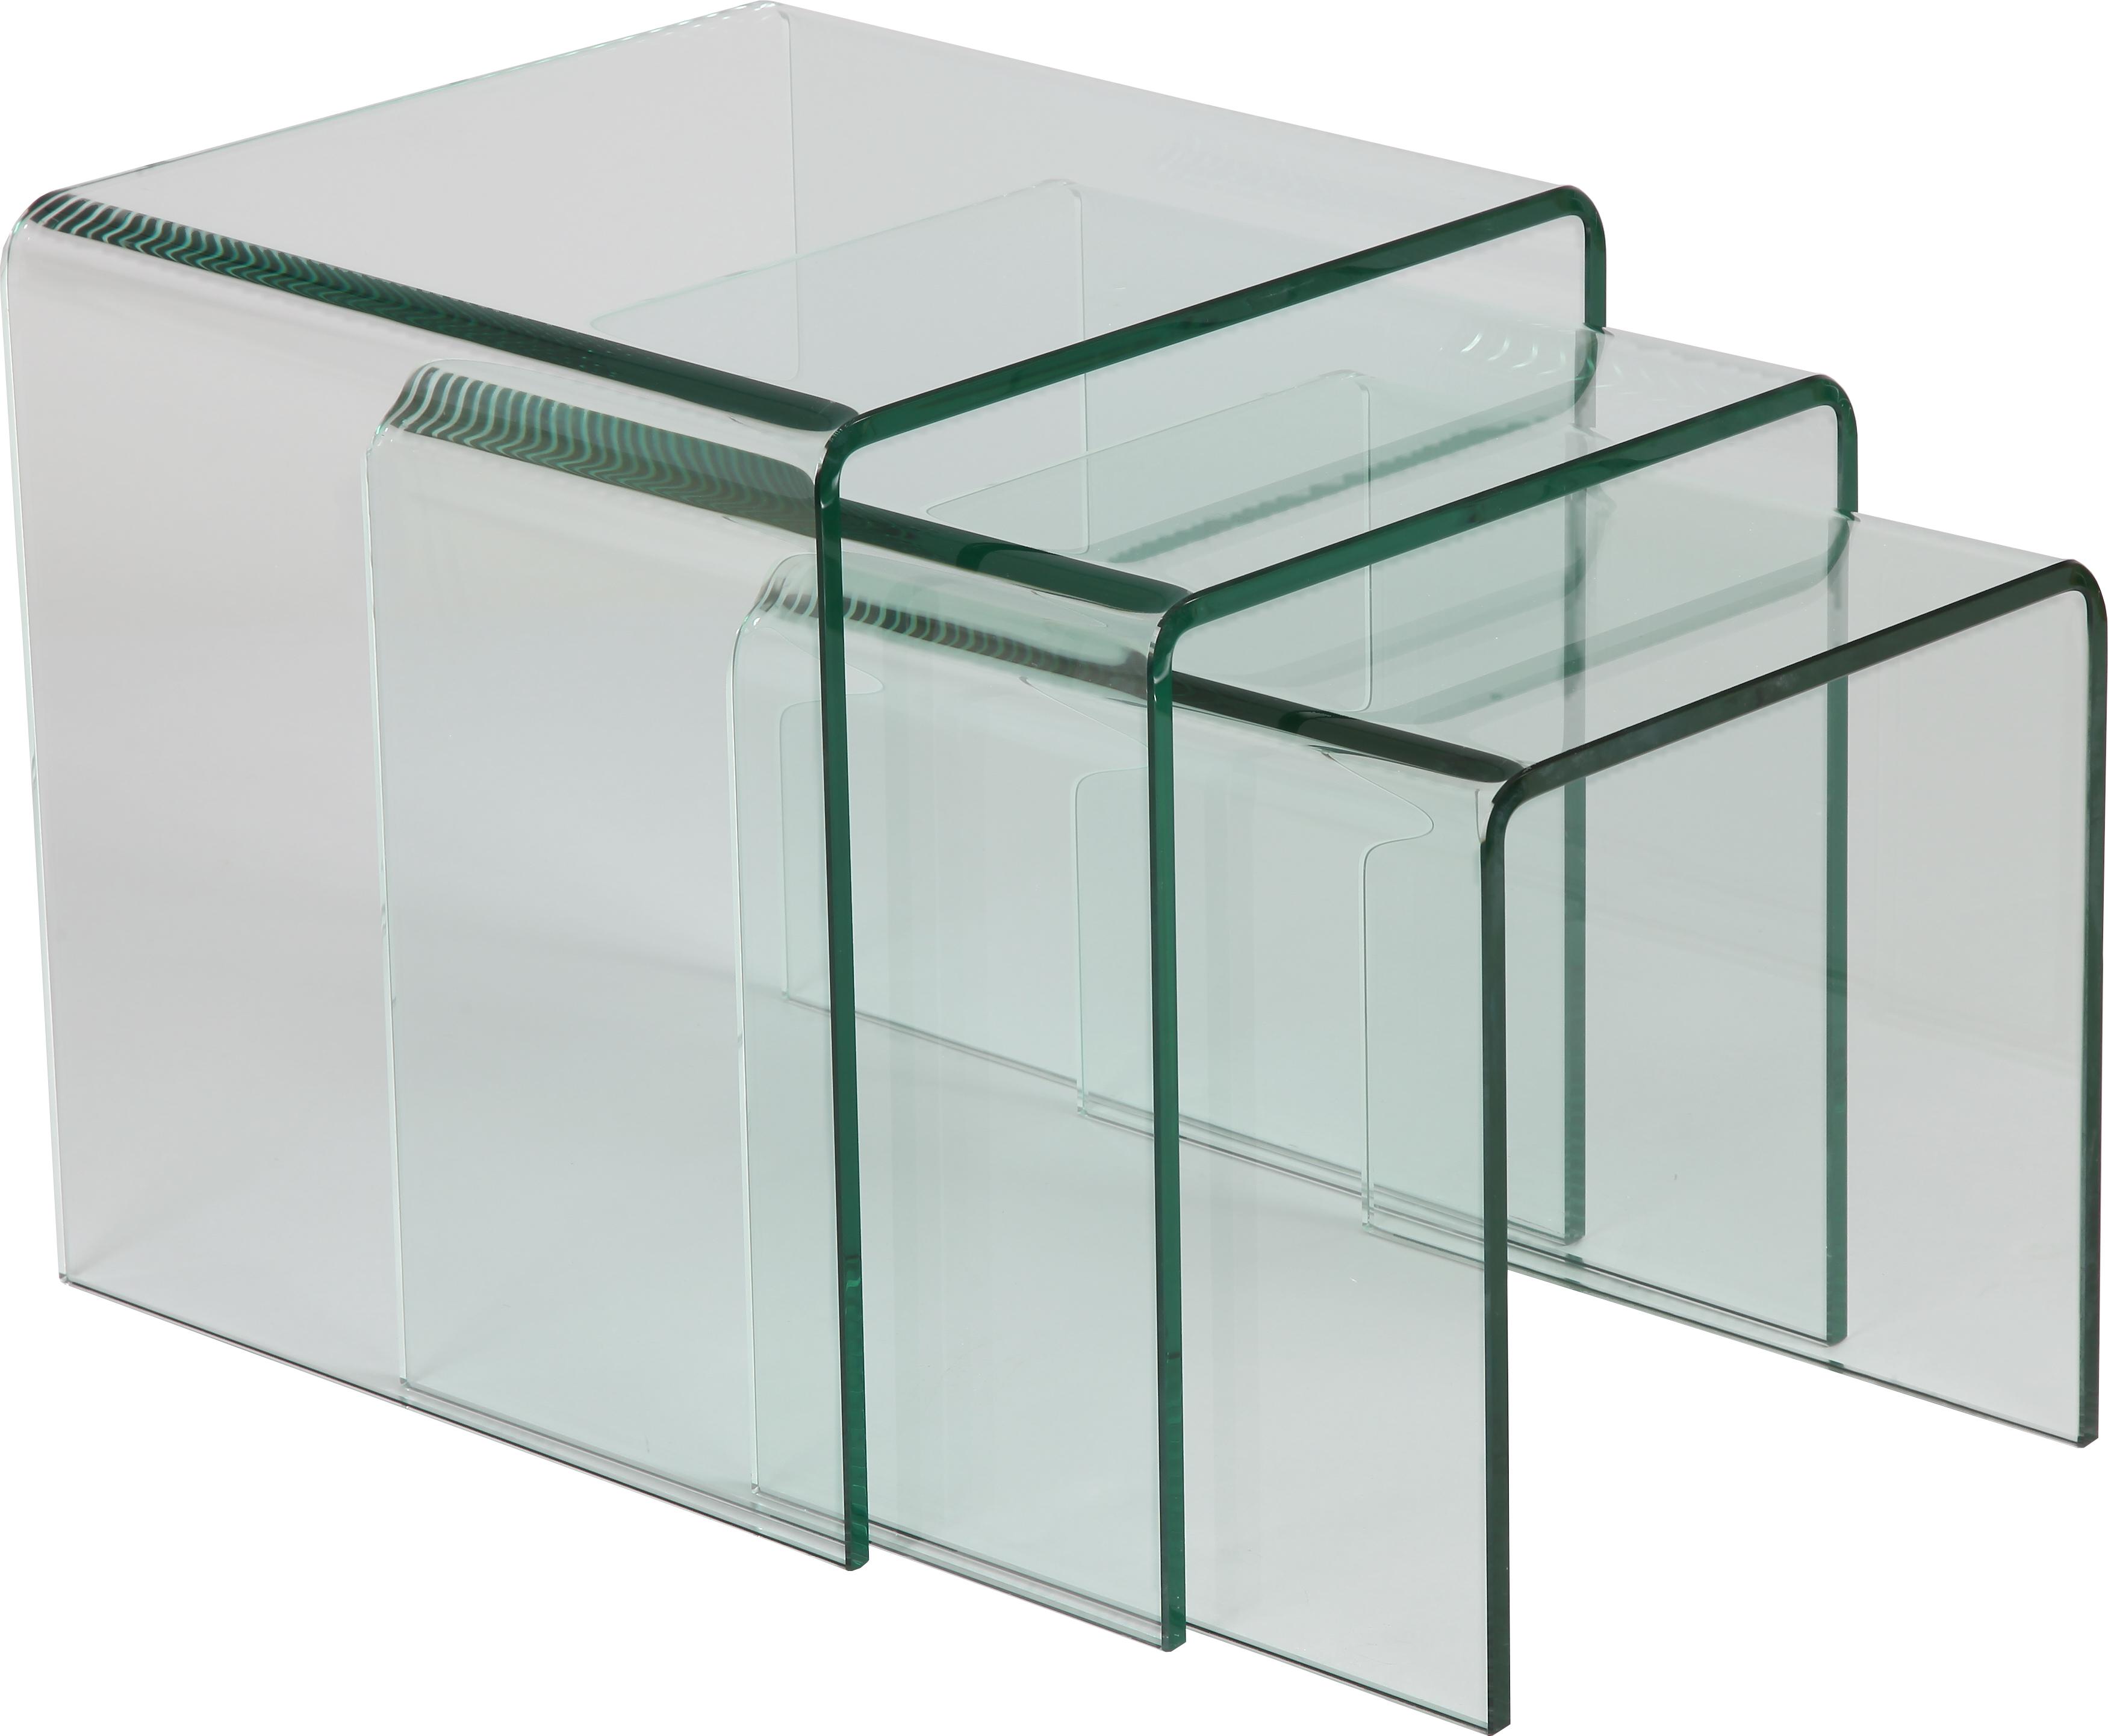 table gigogne en verre comparer les prix et les mod les. Black Bedroom Furniture Sets. Home Design Ideas